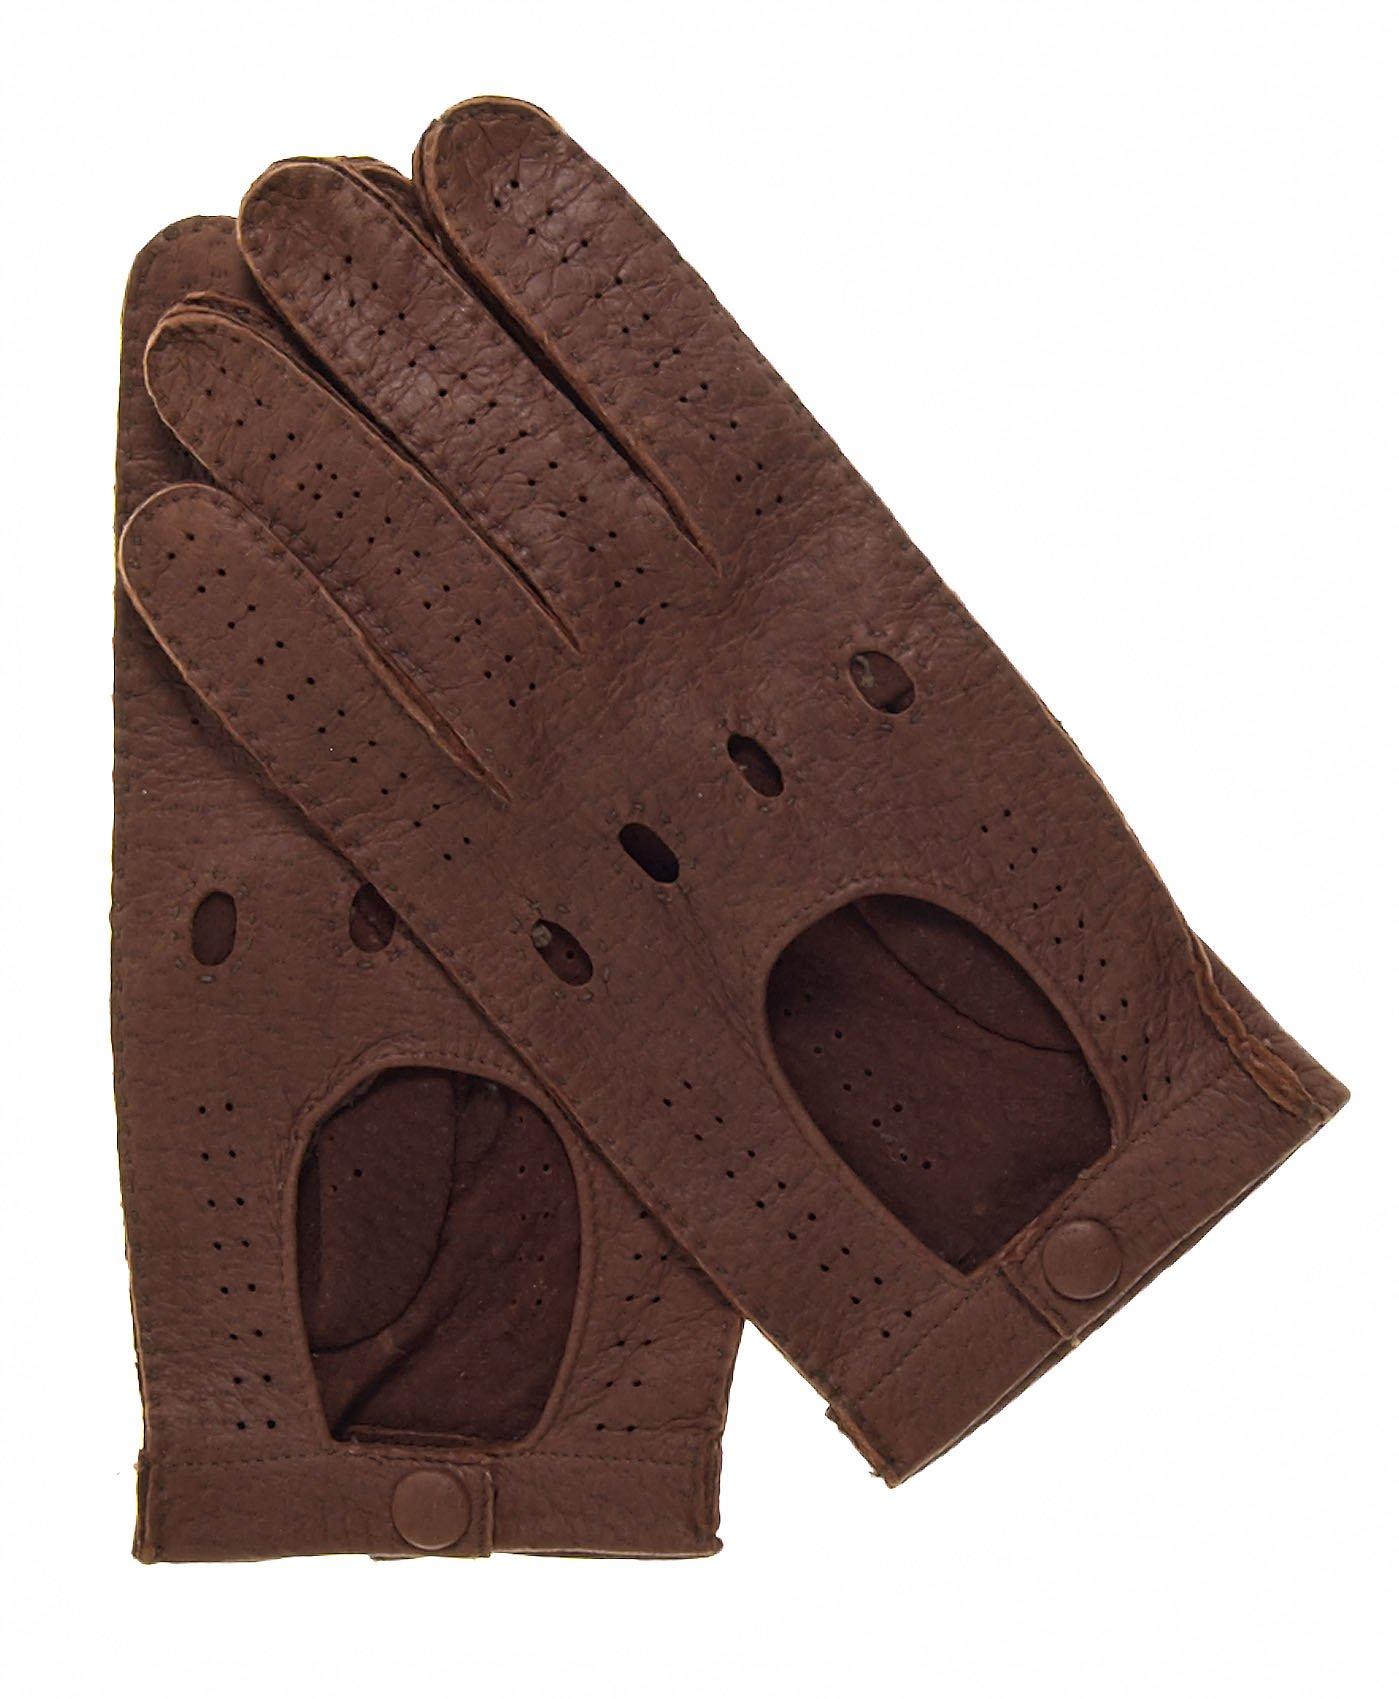 Fratelli Orsini Men's Handsewn Italian Peccary Driving Gloves Size 9 Color Cork